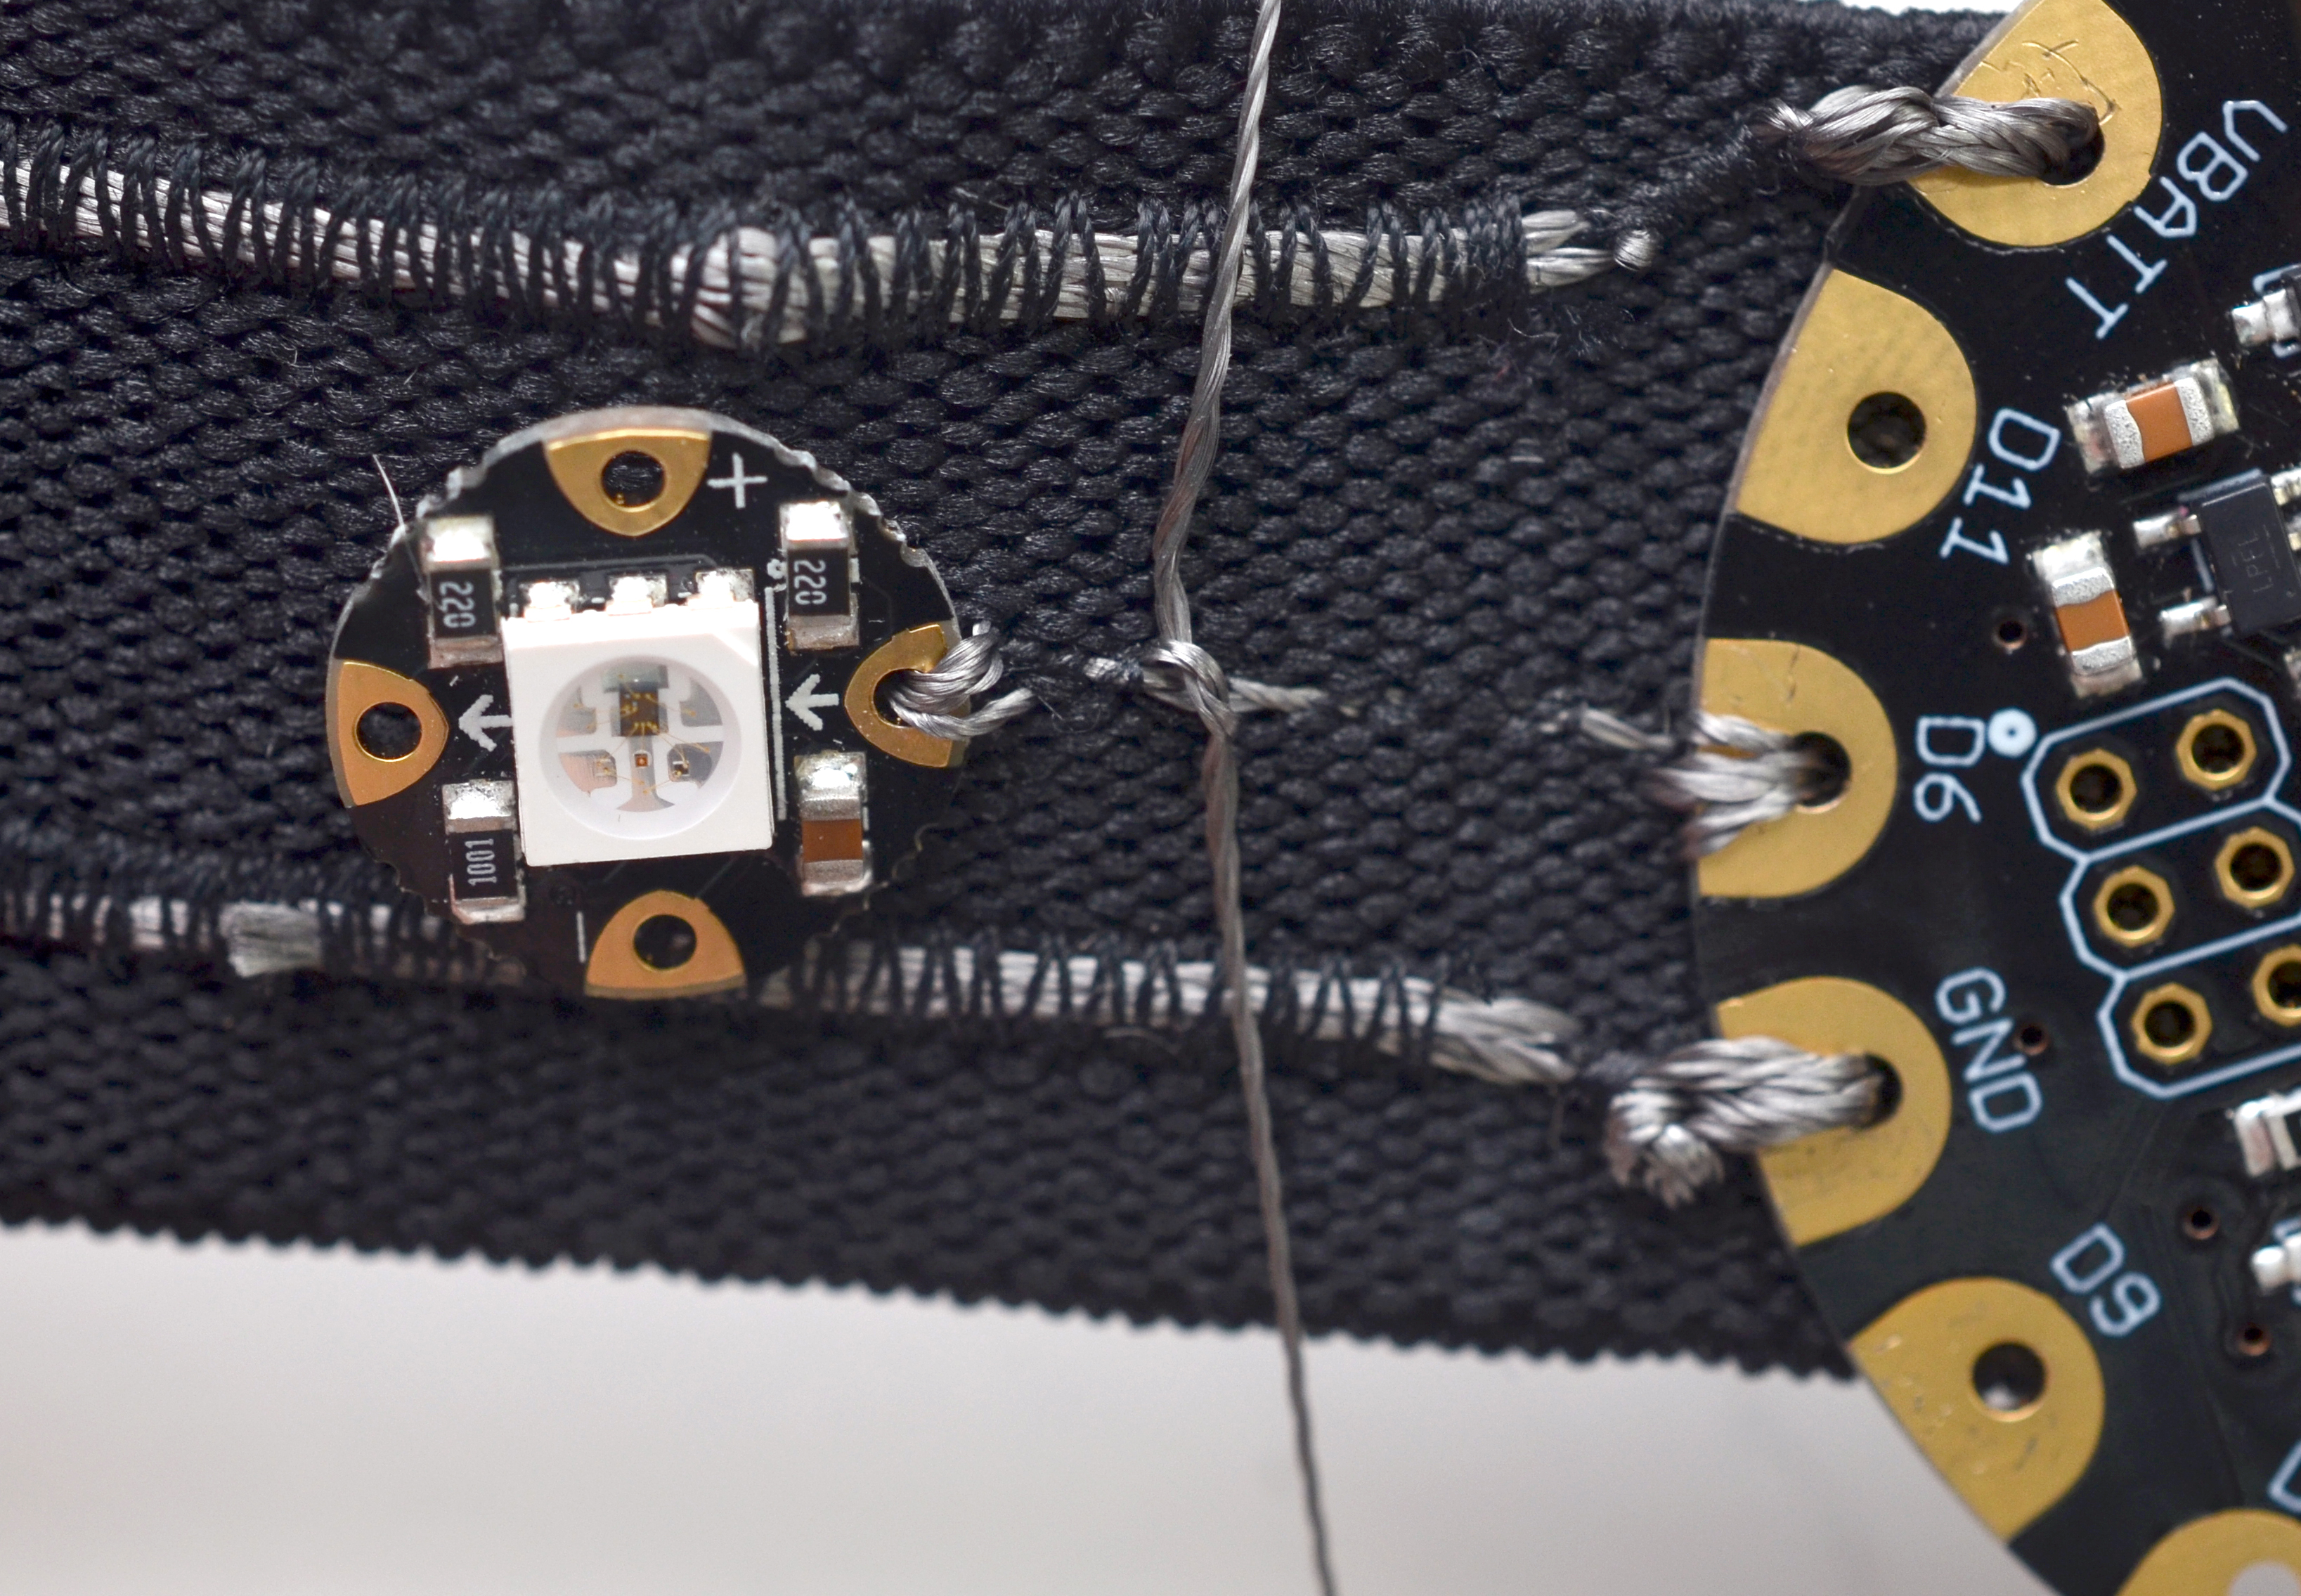 flora_adafruit-pixel-suspenders-12.jpg